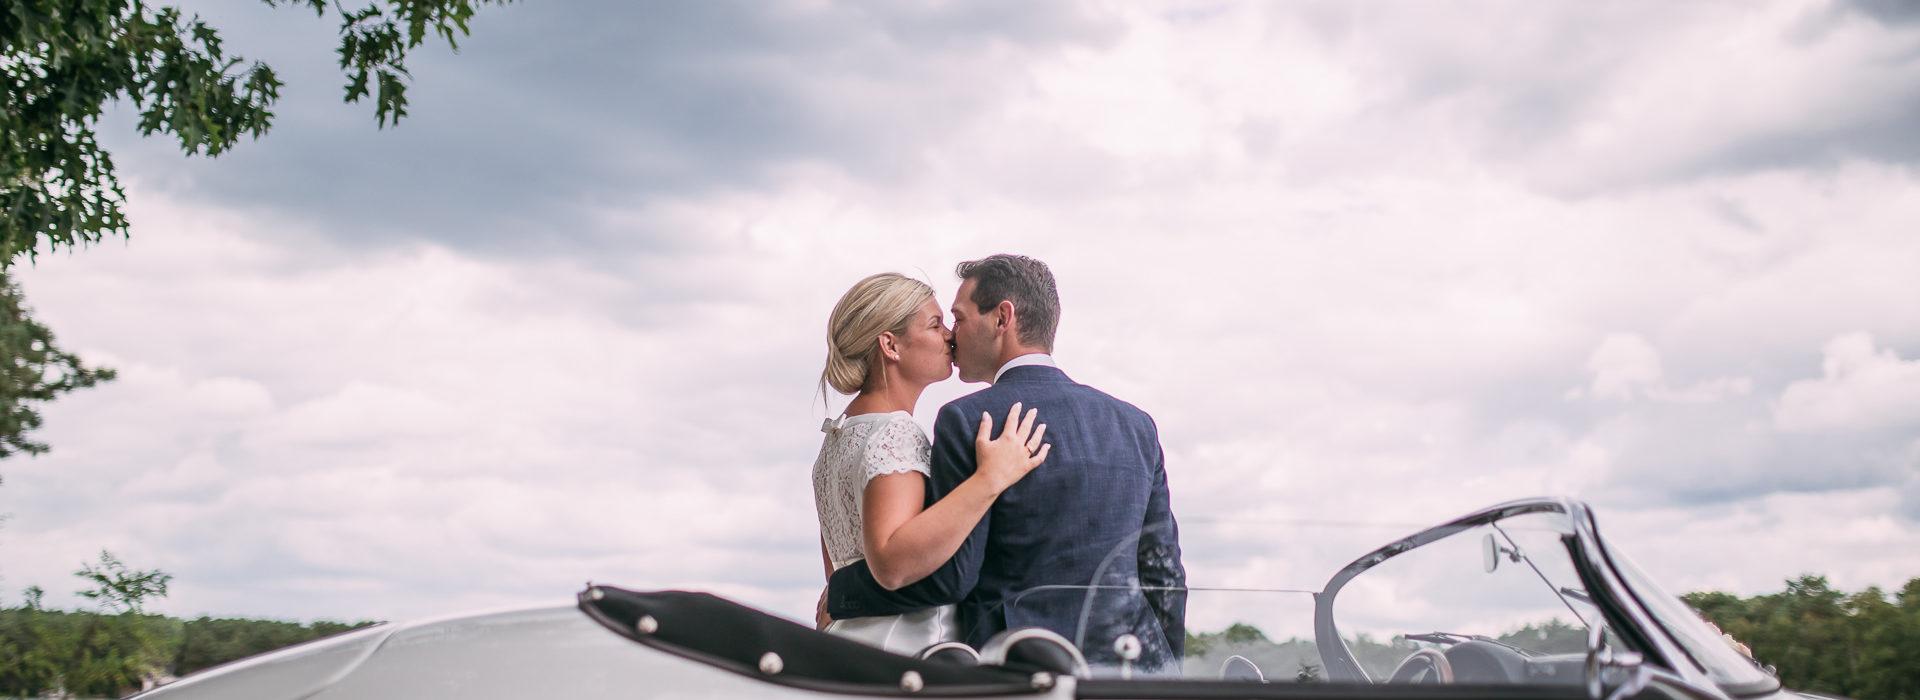 weddingshowbeelden-web-781